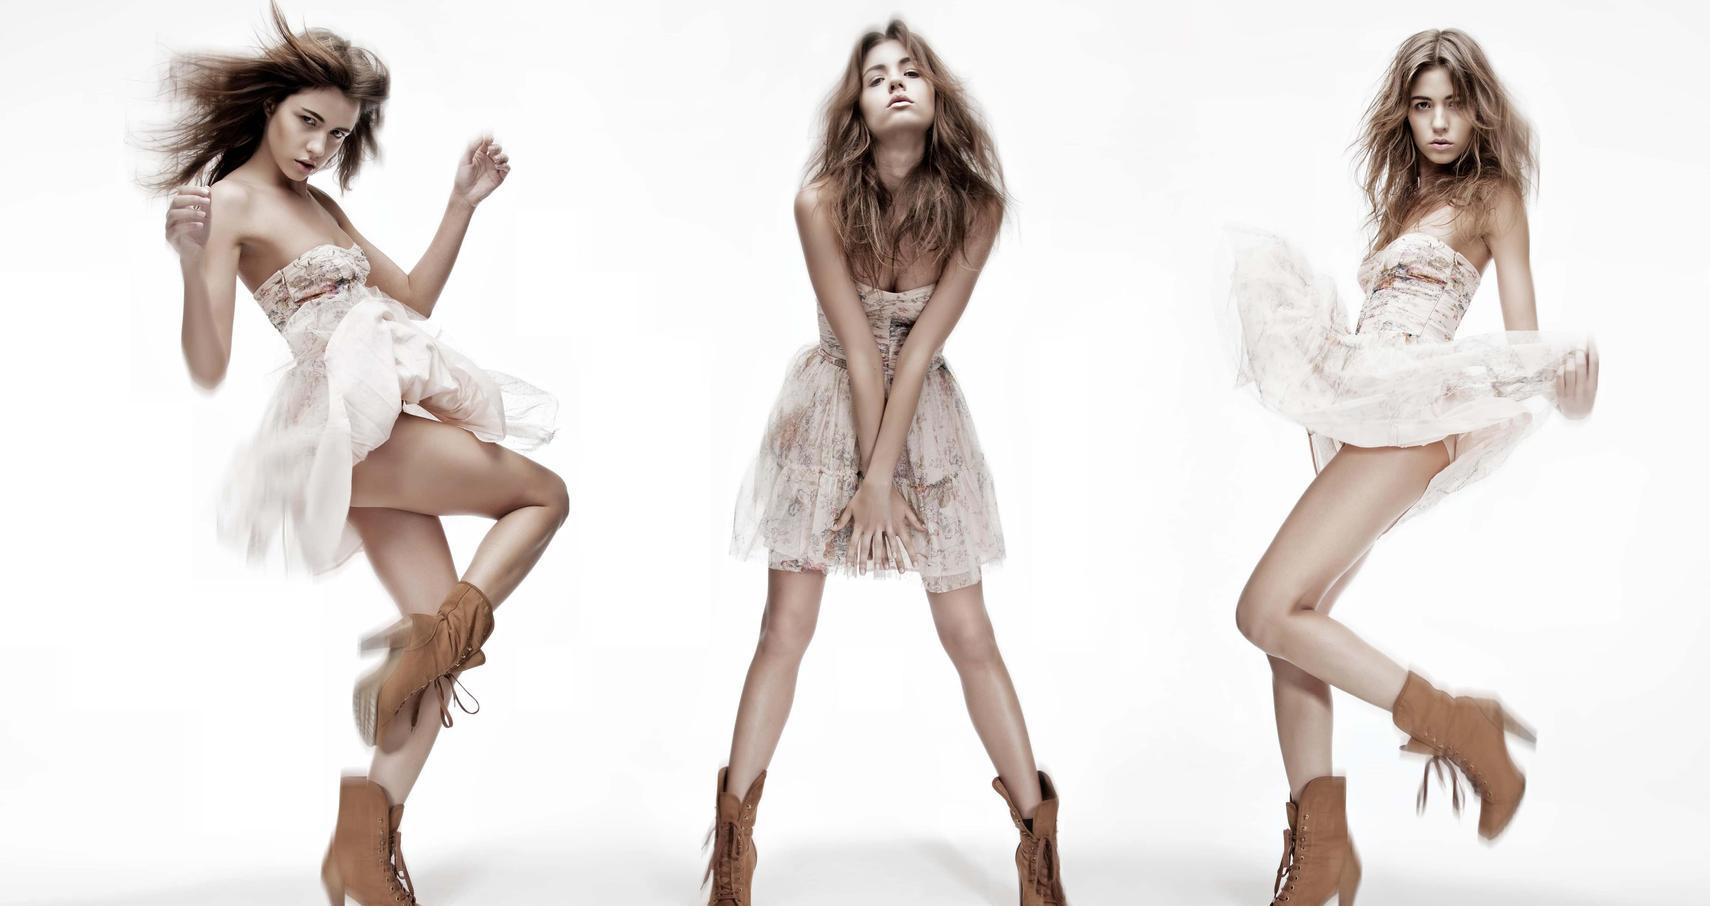 Top female poses that guarantee amazing portraits skylum blog